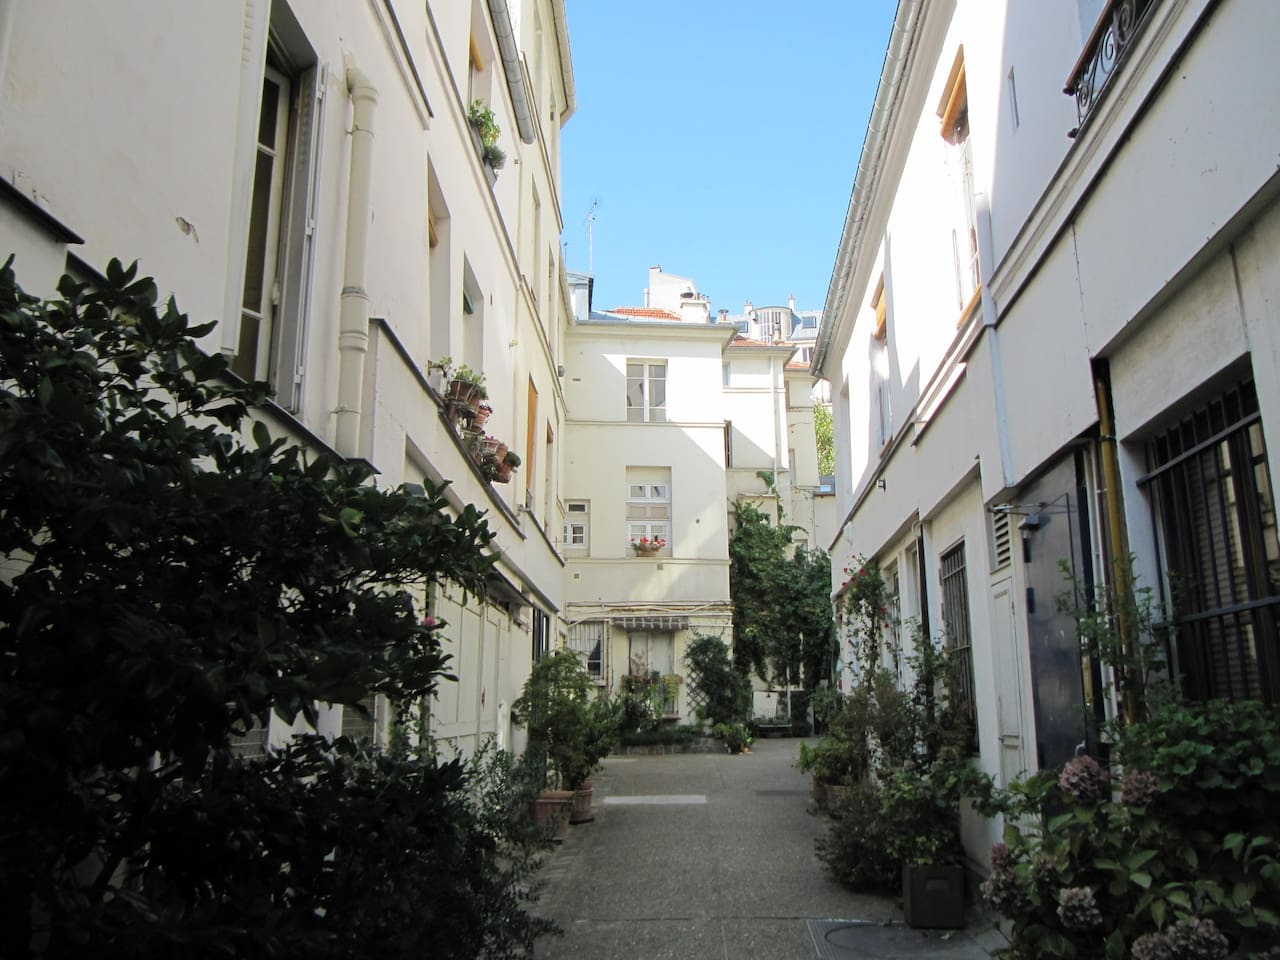 The private courtyard - la cour privée